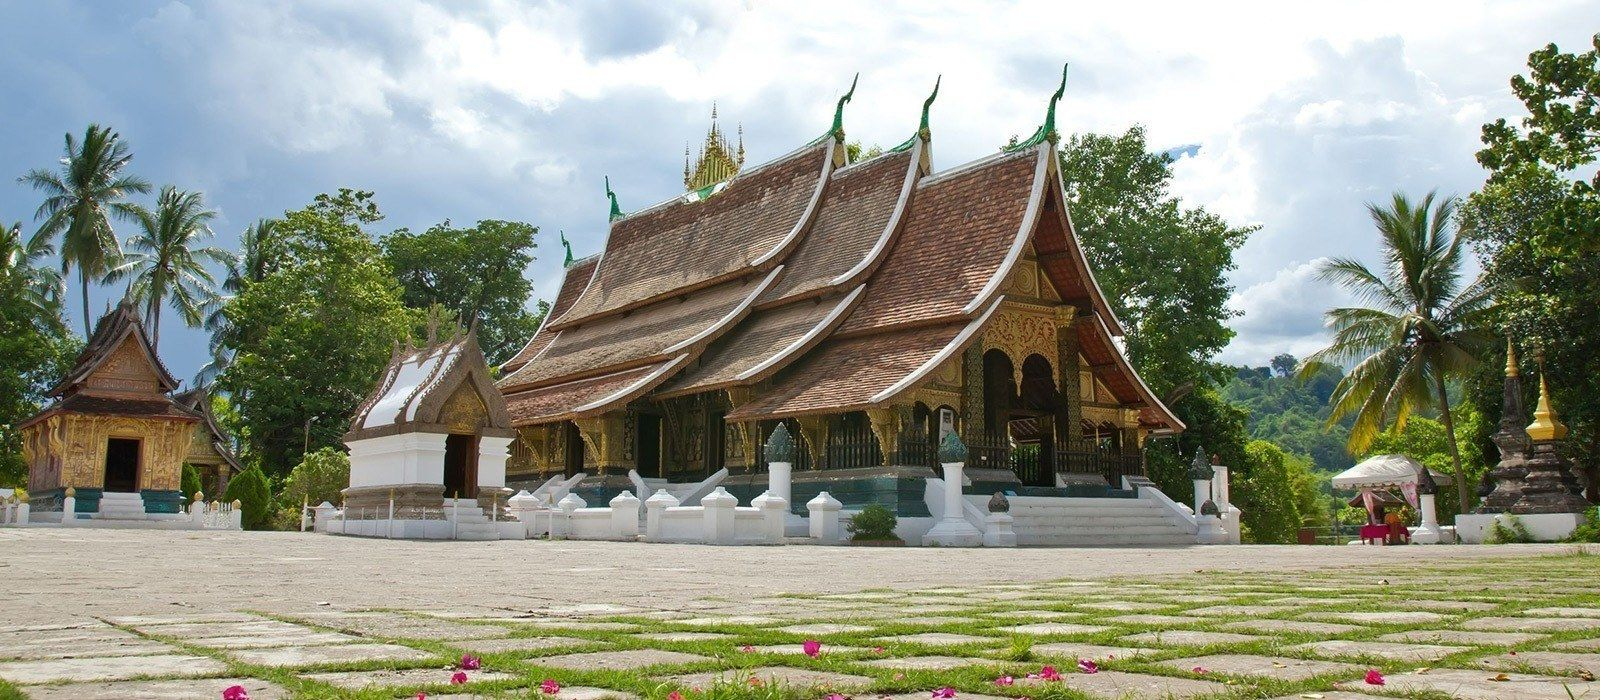 Undiscovered Laos Tour Trip 1